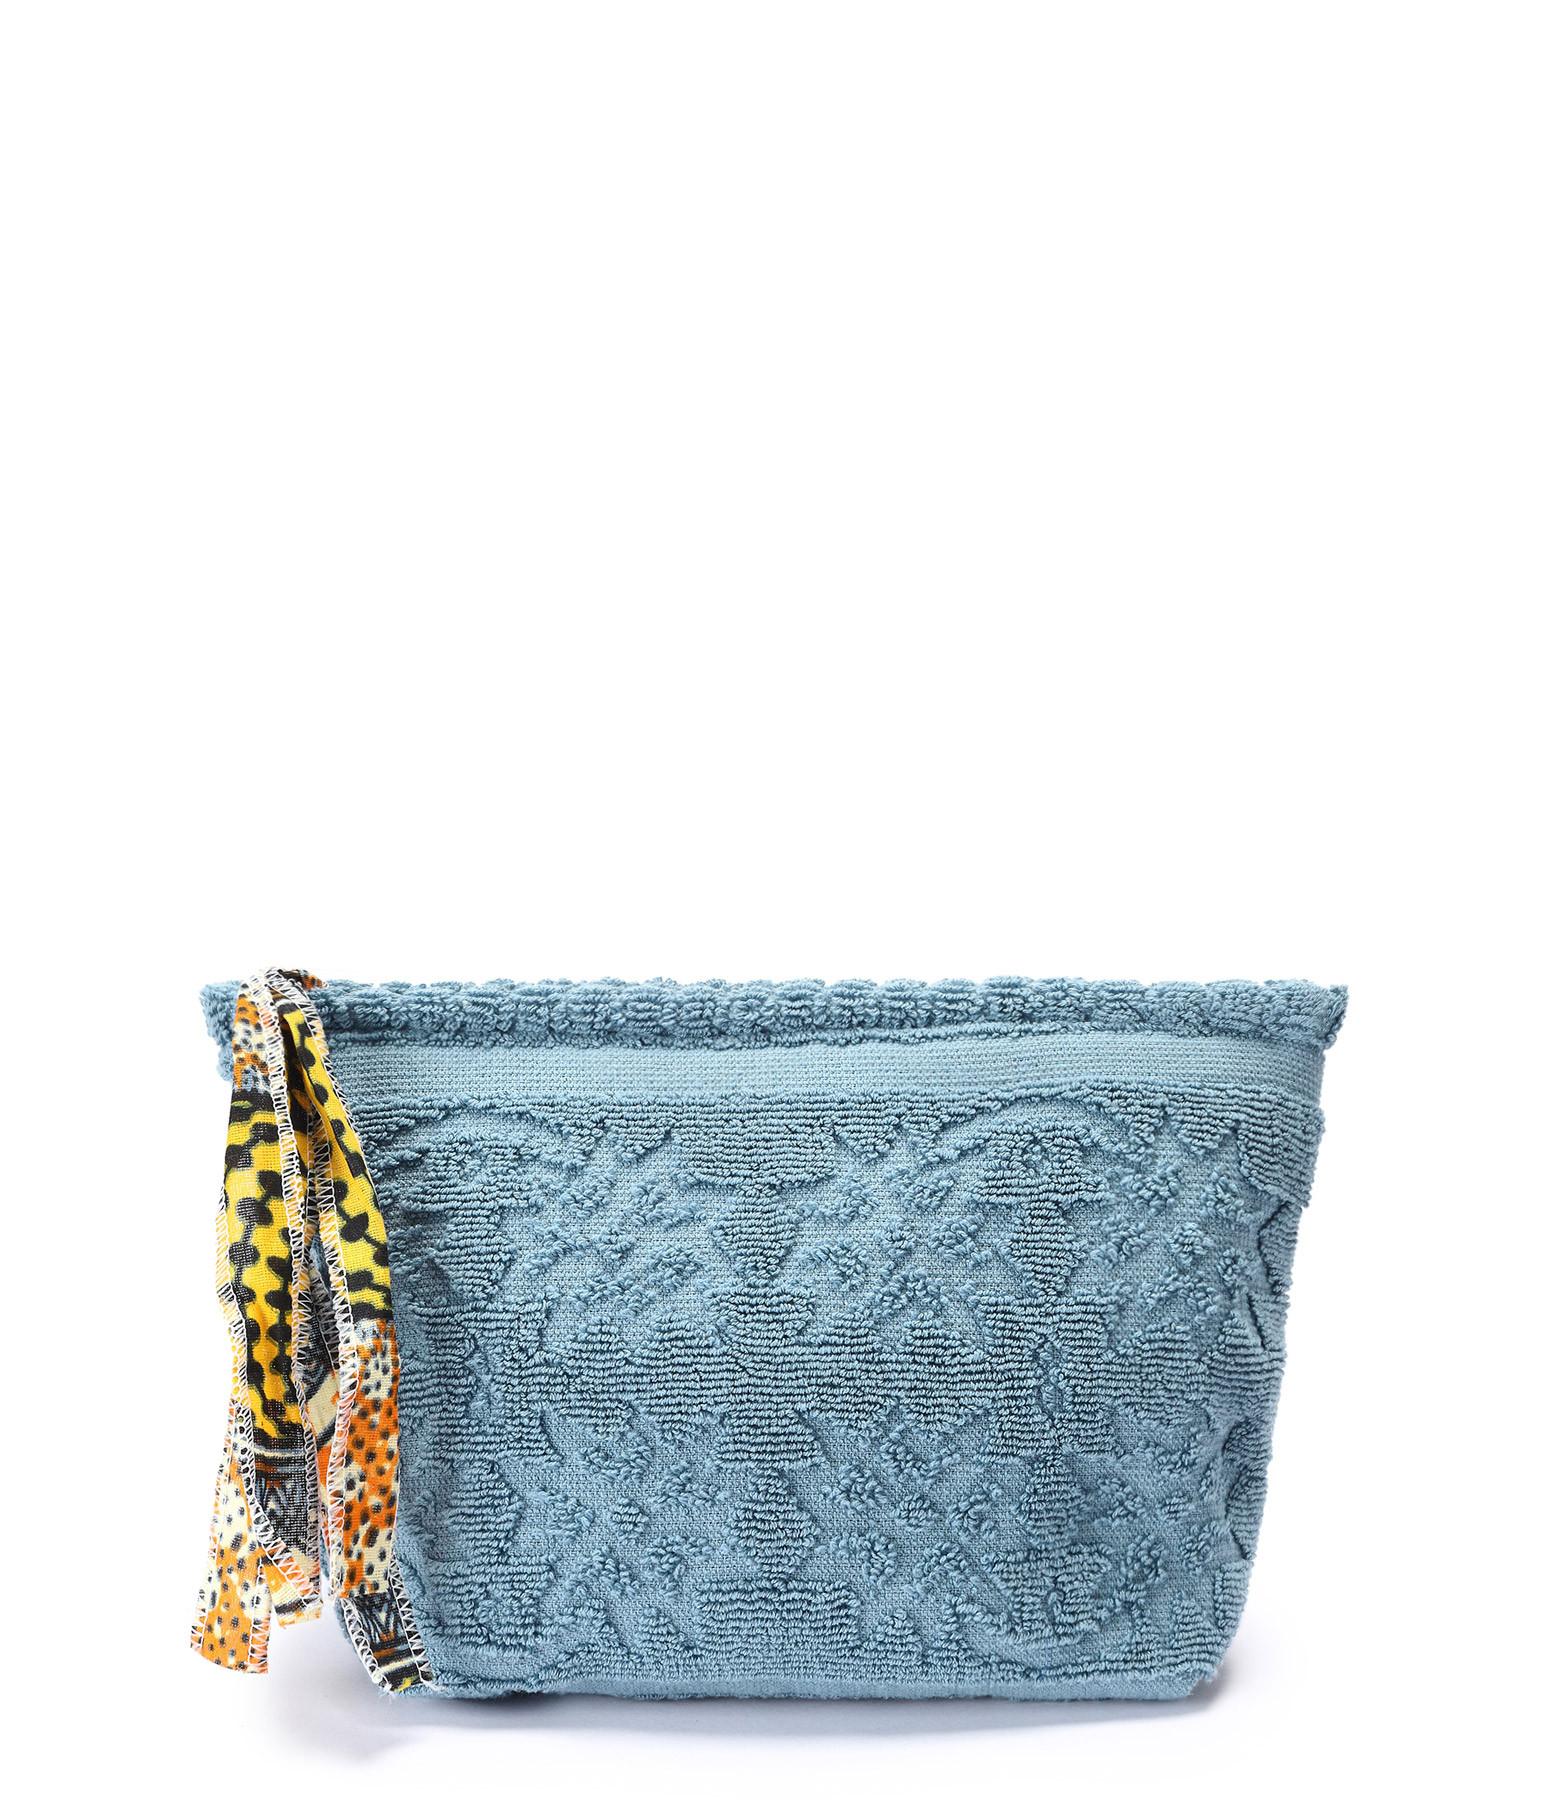 LALLA - Petite Trousse Walakin Eponge Denim